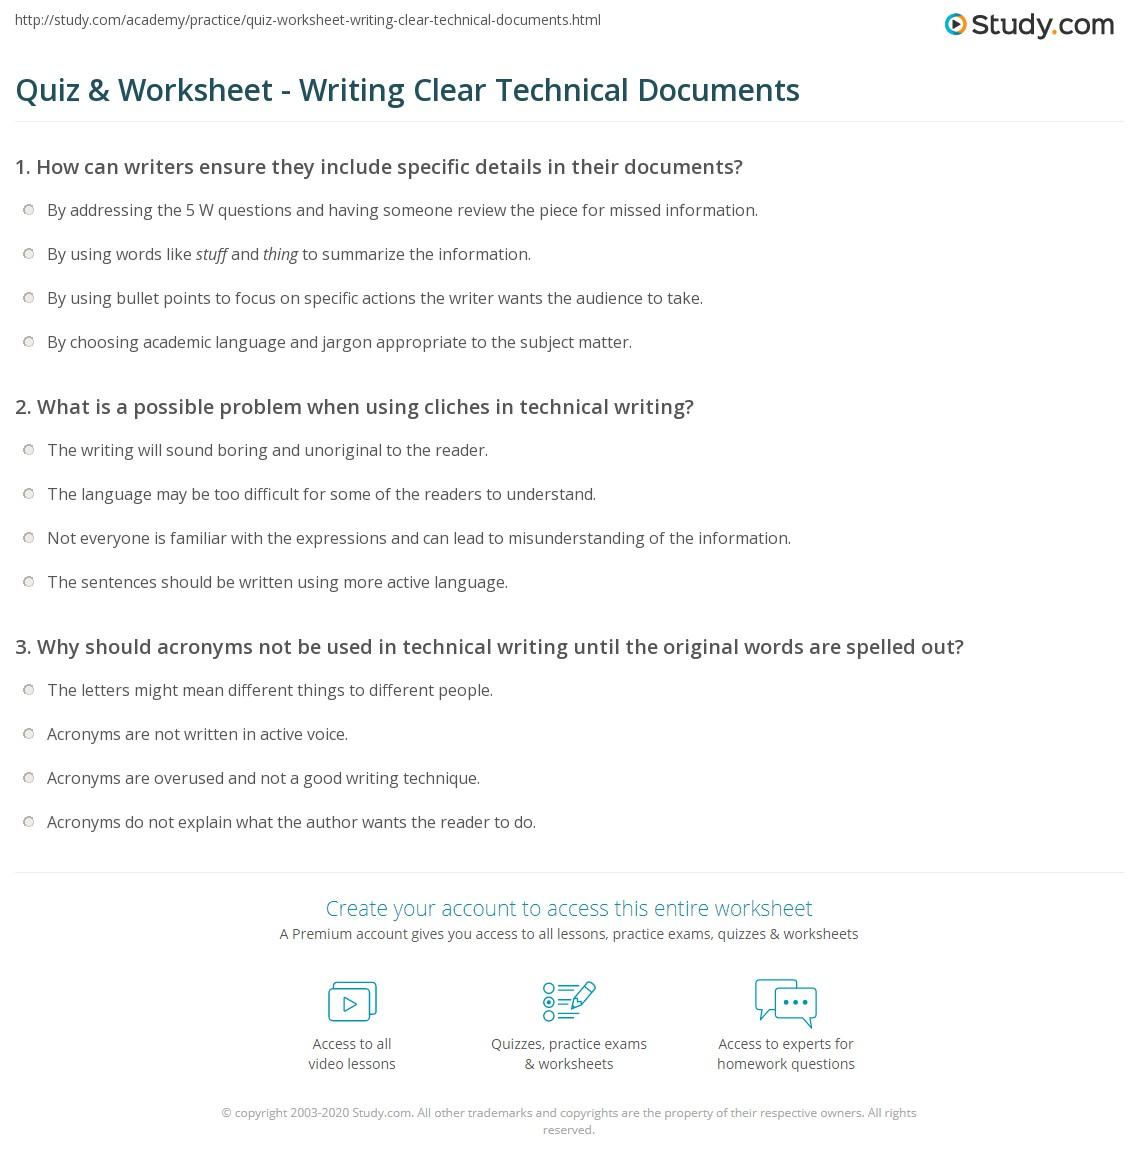 Quiz & Worksheet - Writing Clear Technical Documents | Study.com